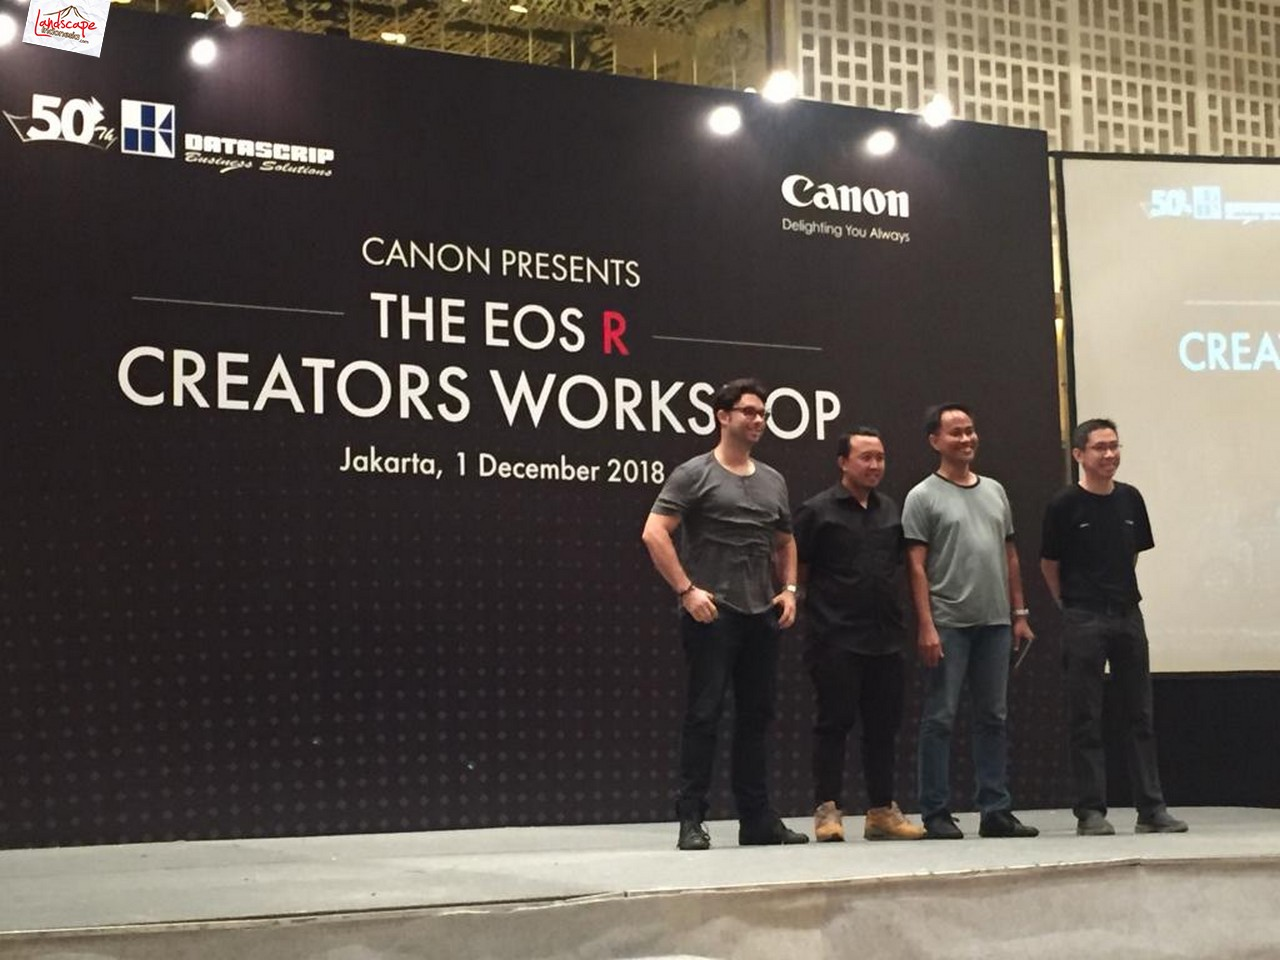 eos r creators workshop 6 - EOS R Creators Workshop